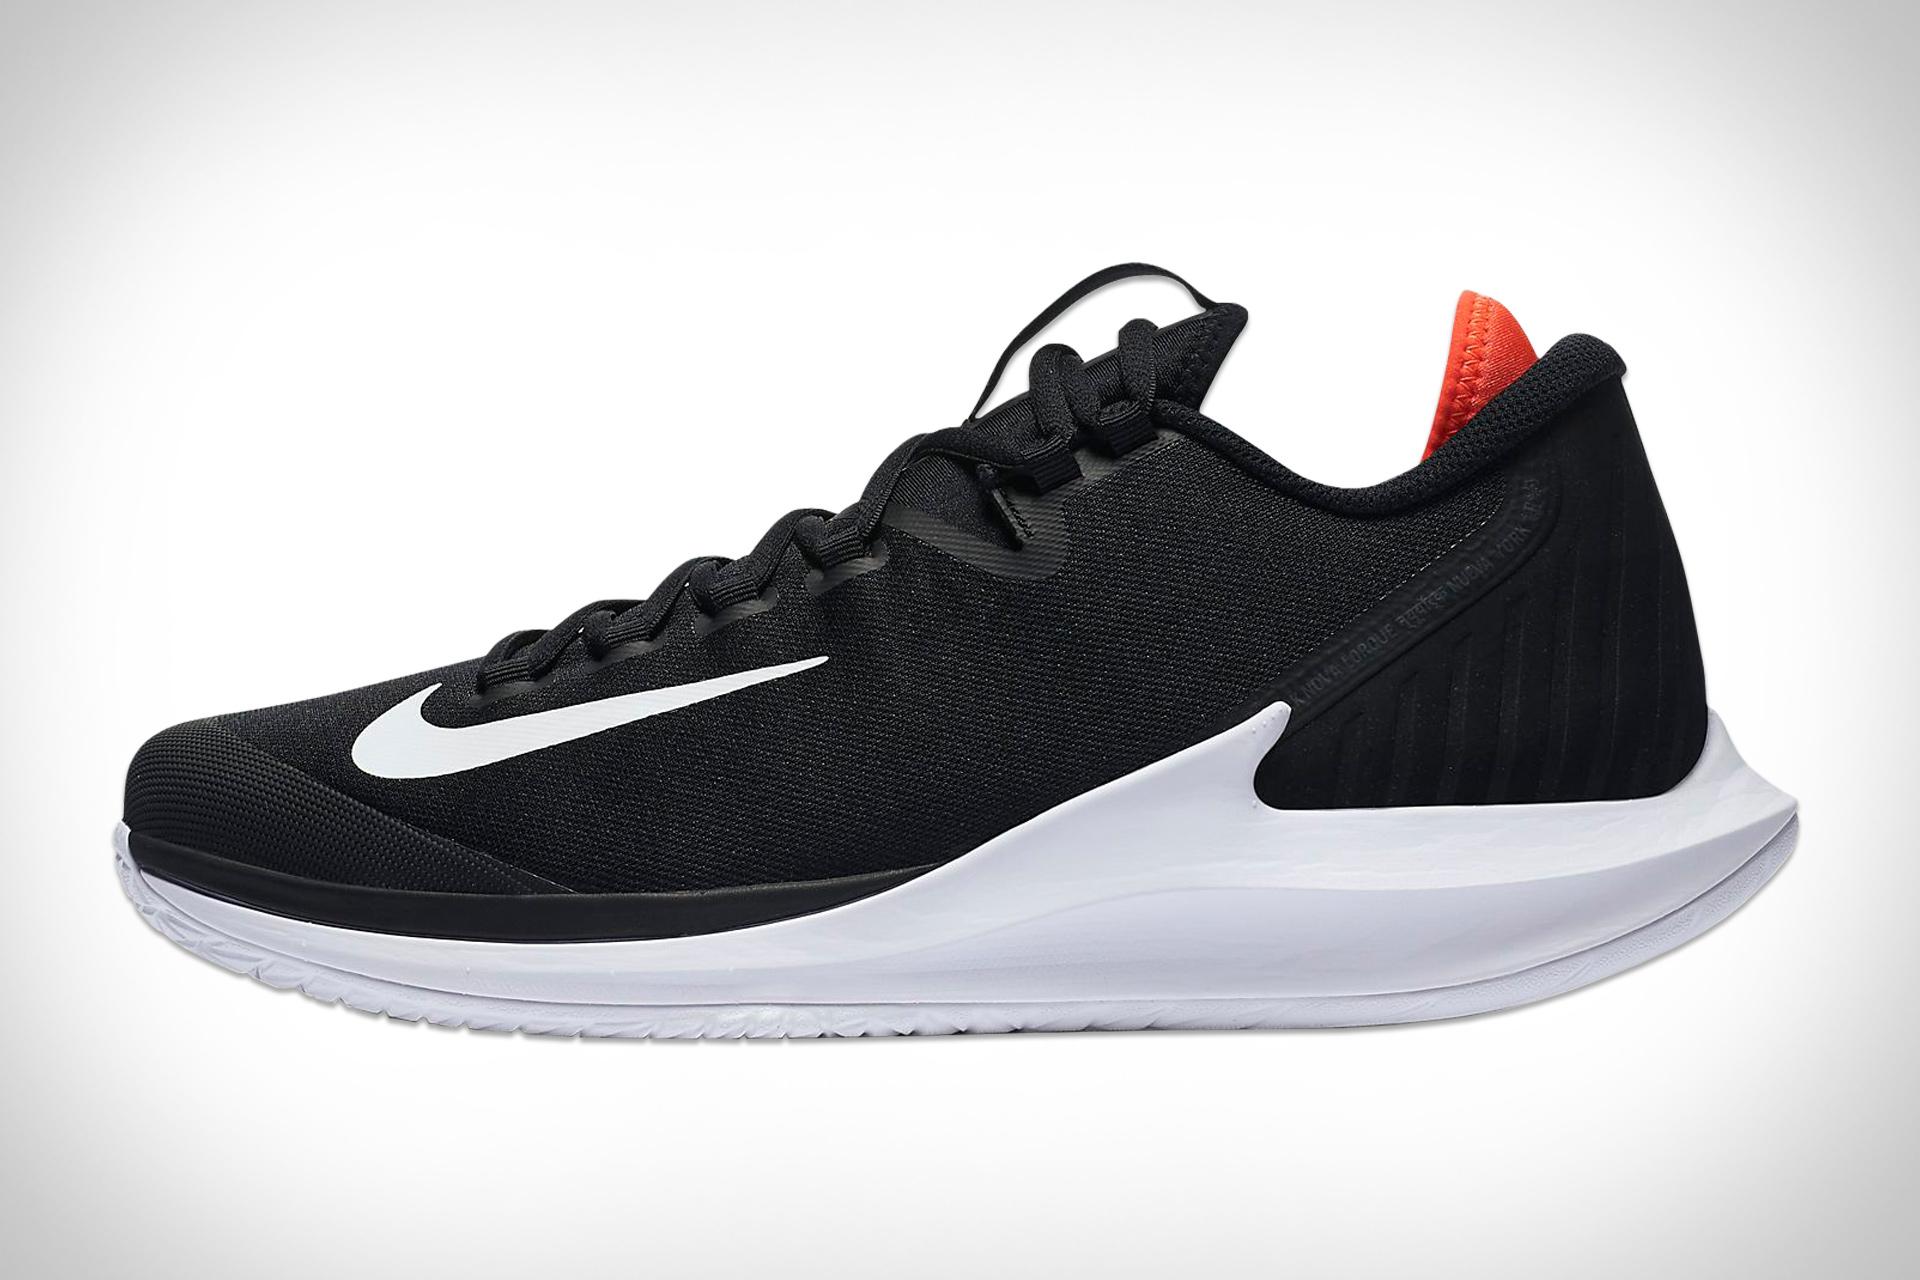 Zoom NikeCourt TennisschuheUncrate Zero Air HC 534ALjqR